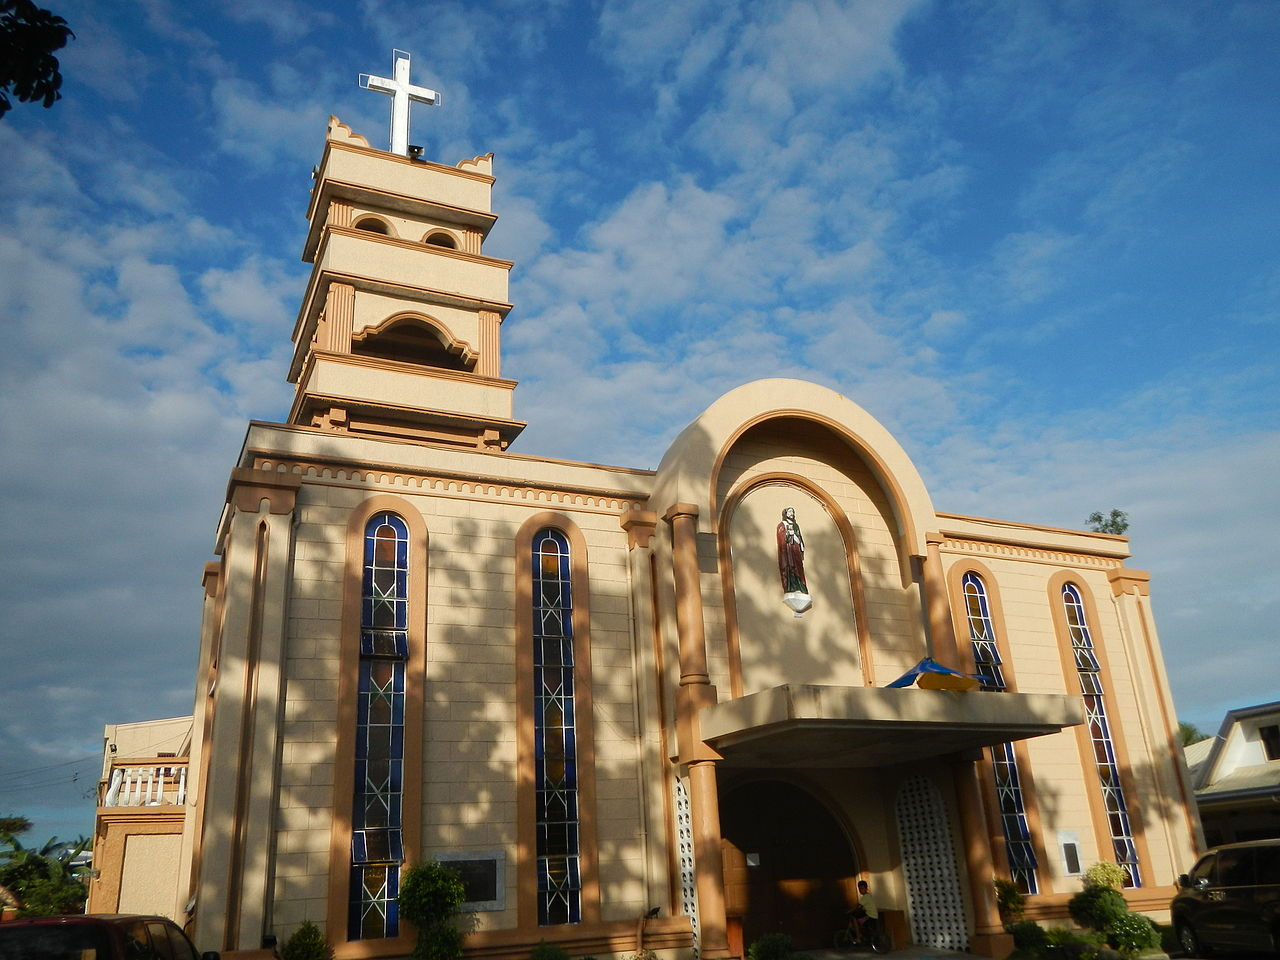 7 Passenger Vehicles >> File:St. Jude Thaddeus Church in Brgy. Cotta, Lucena City.jpg - Wikimedia Commons